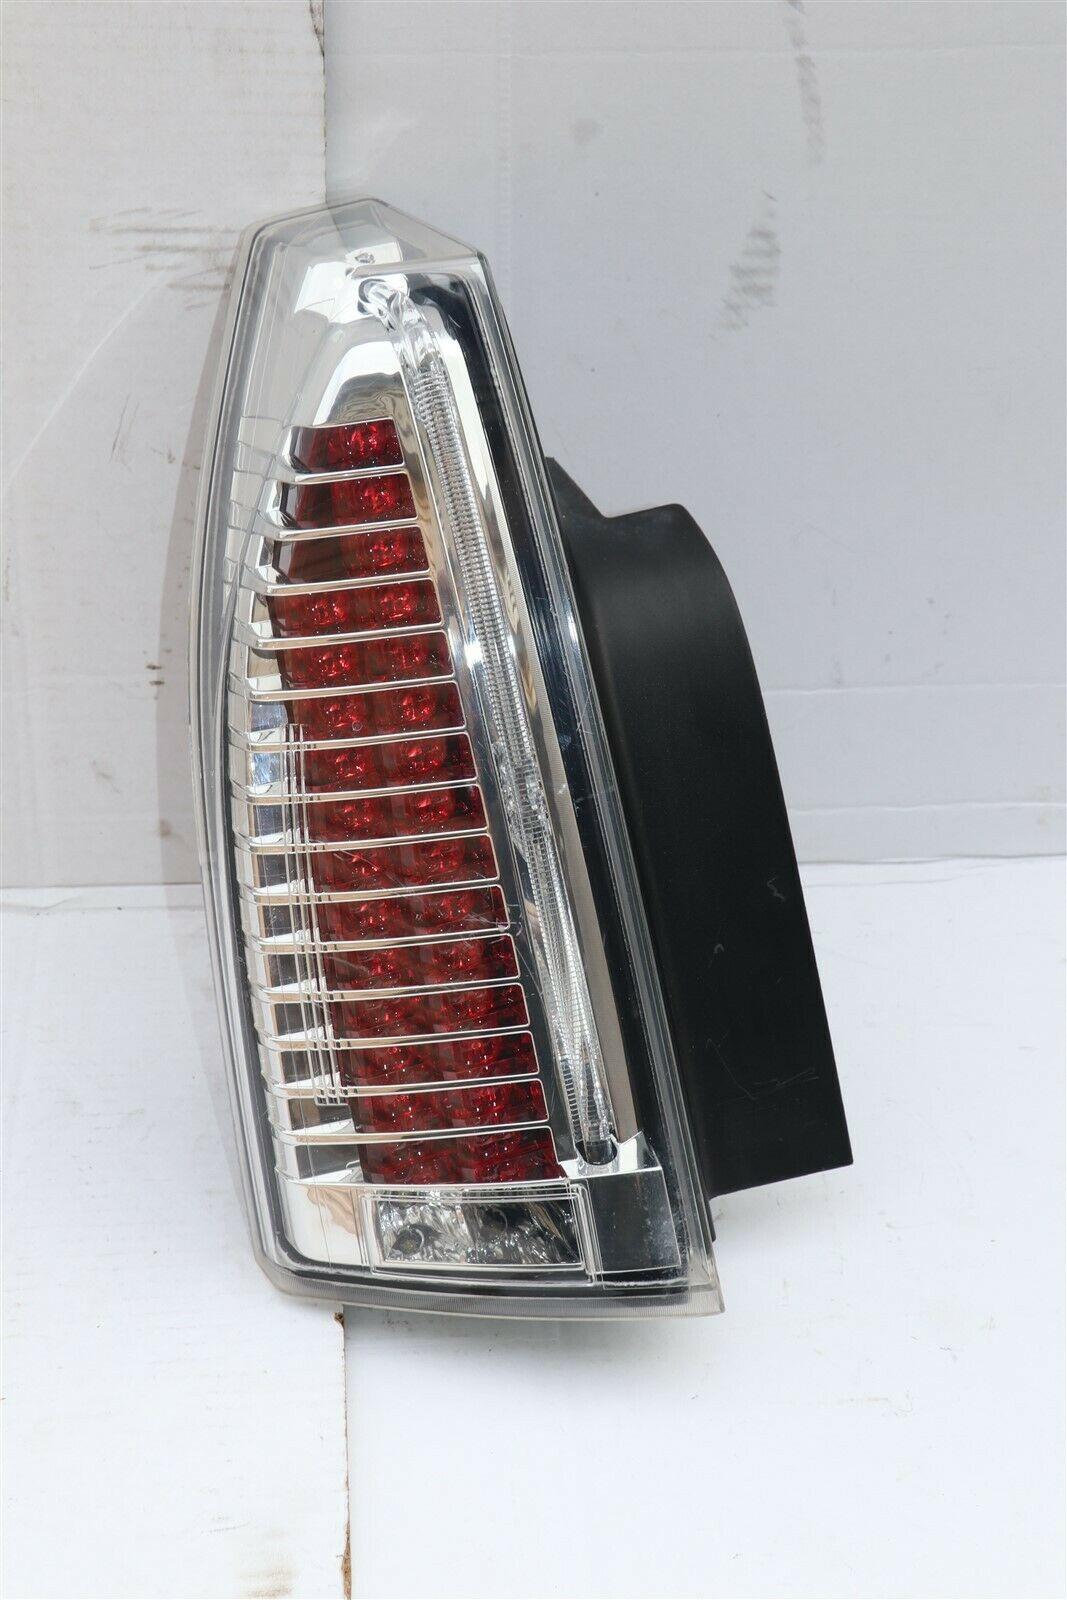 08-13 Cadillac CTS 4 door Sedan Euro LED Rear Tail Light Lamp Driver Left LH